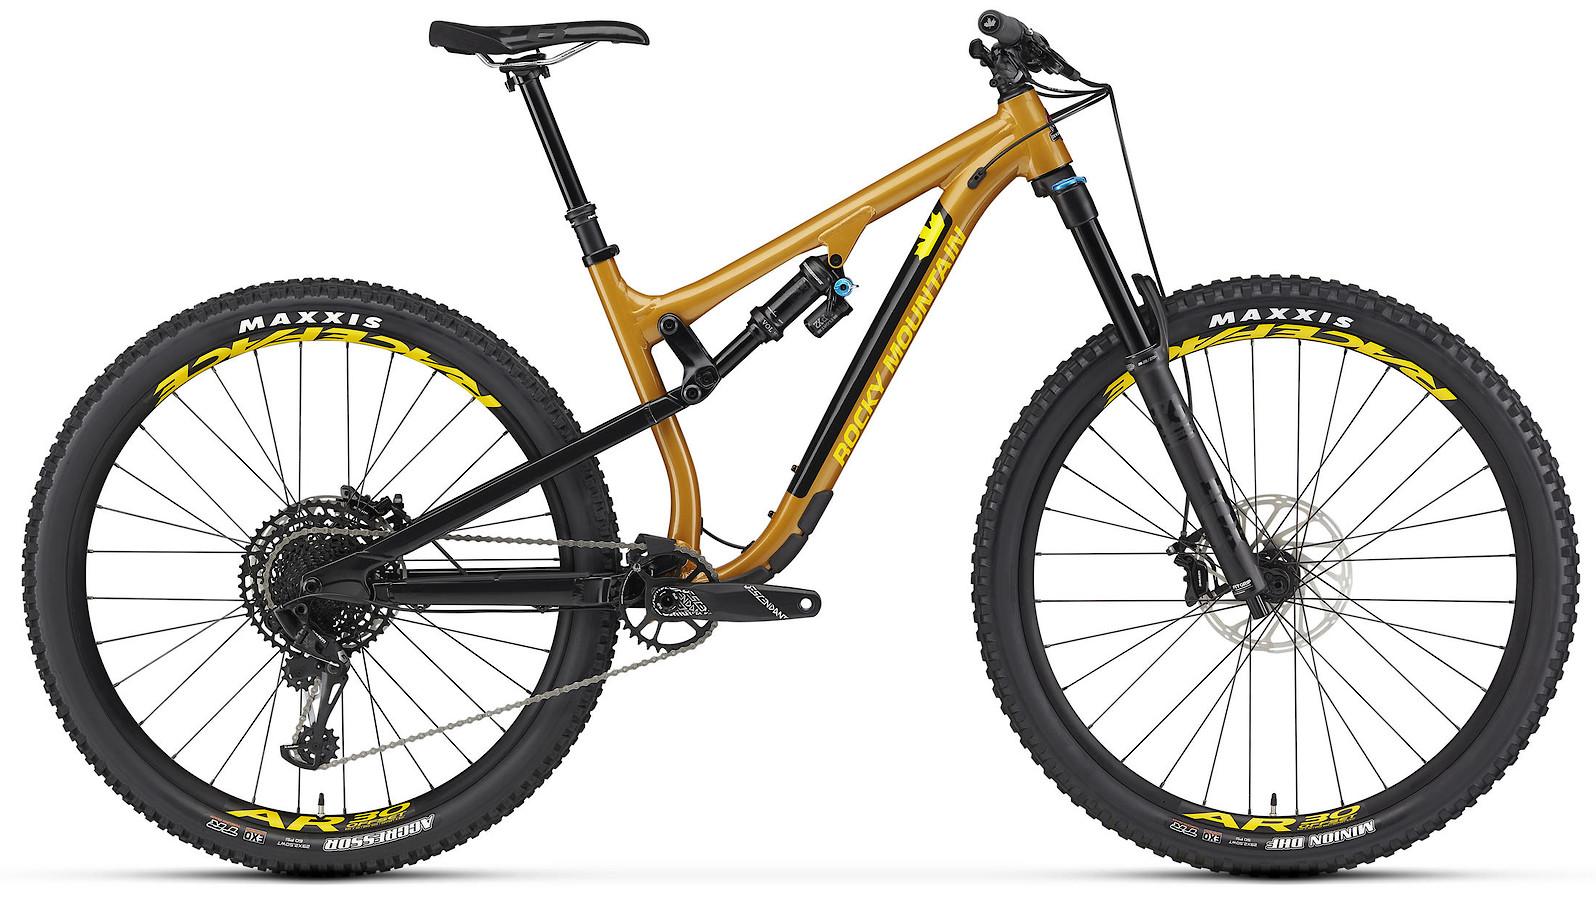 2020 Rocky Mountain Instinct Alloy 50 BC Edition Orange Black and Yellow